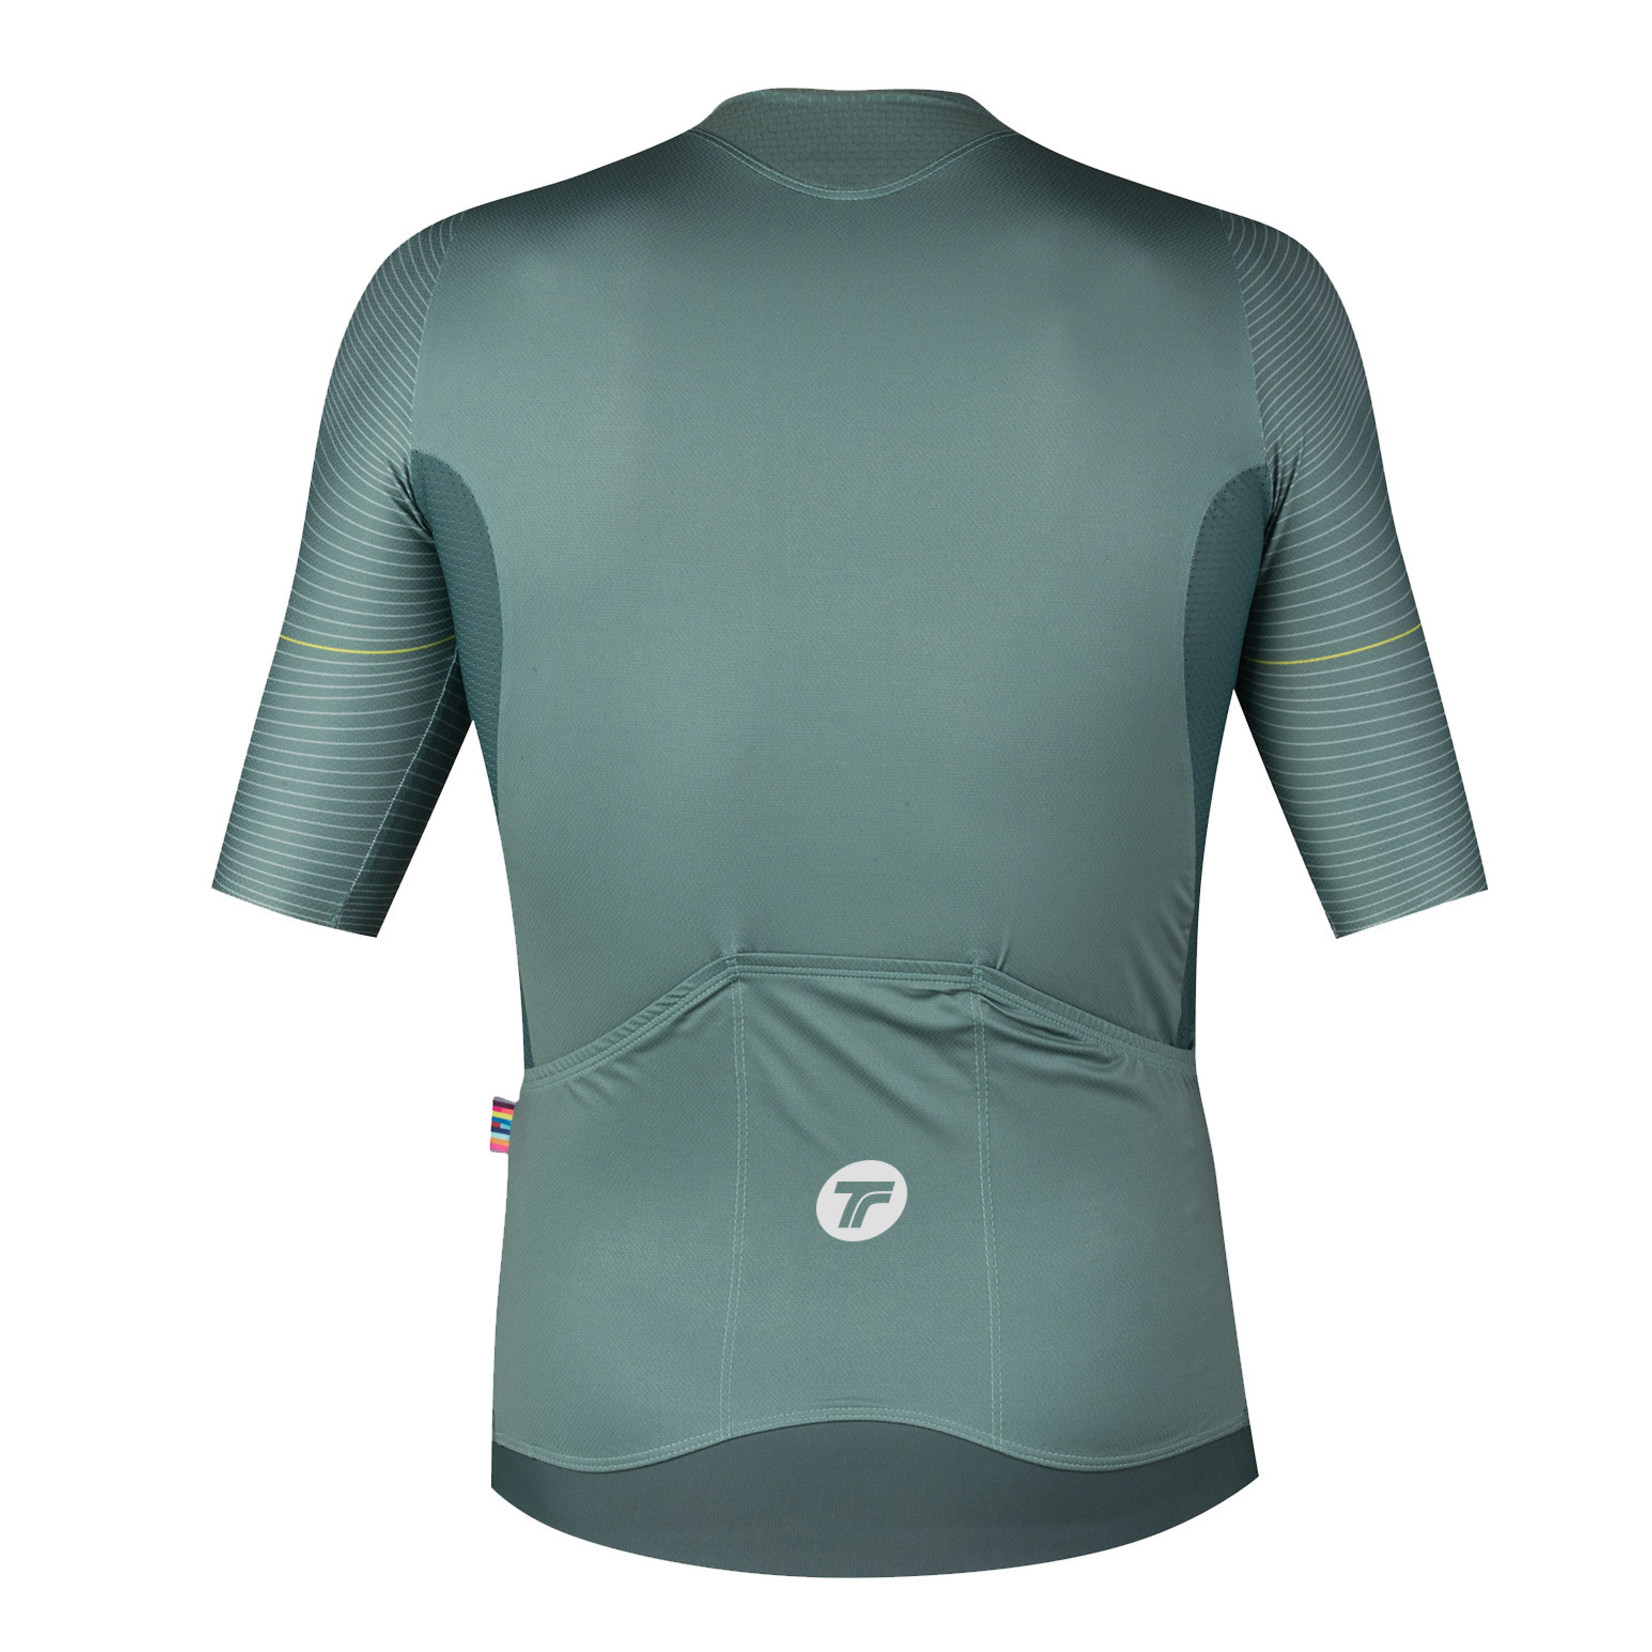 Tactic TACTIC Short Sleeve Jersey - Signature - Botafogo